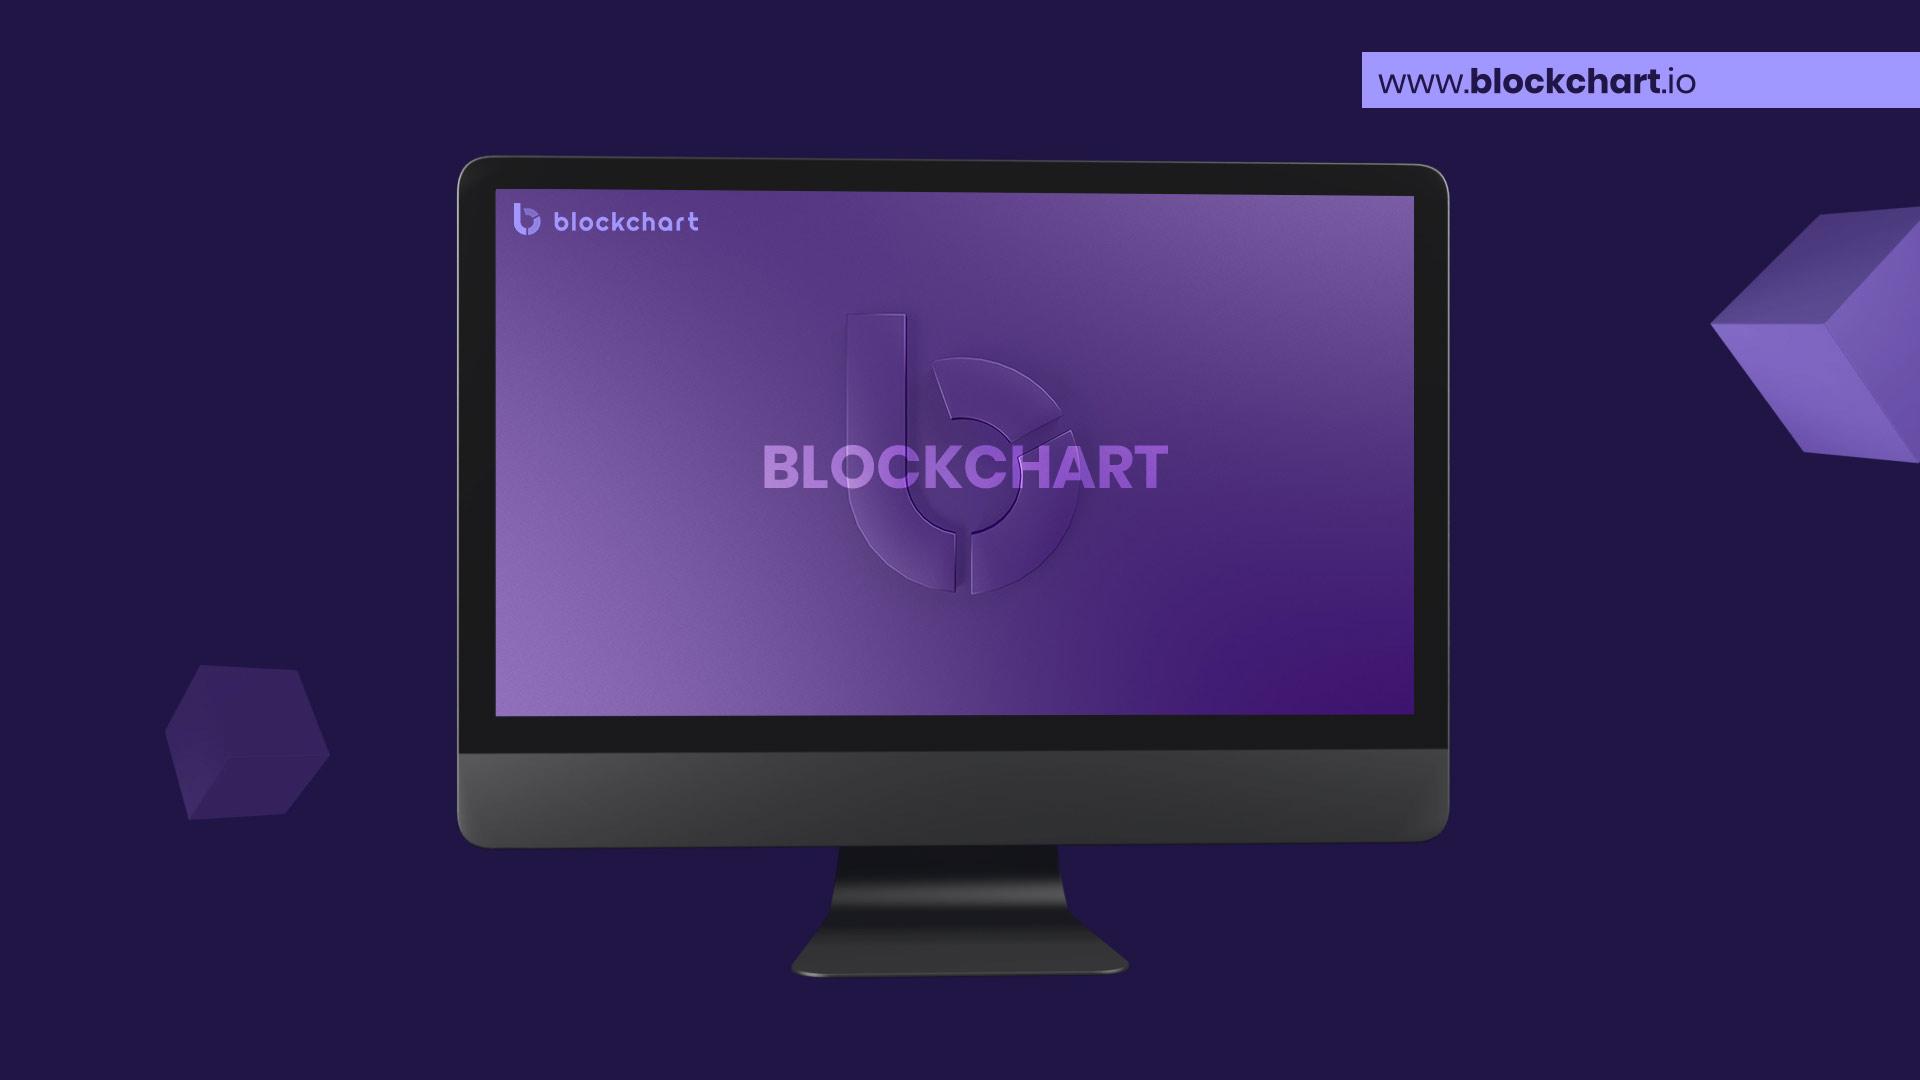 blockchart-launch-video-thumbnail